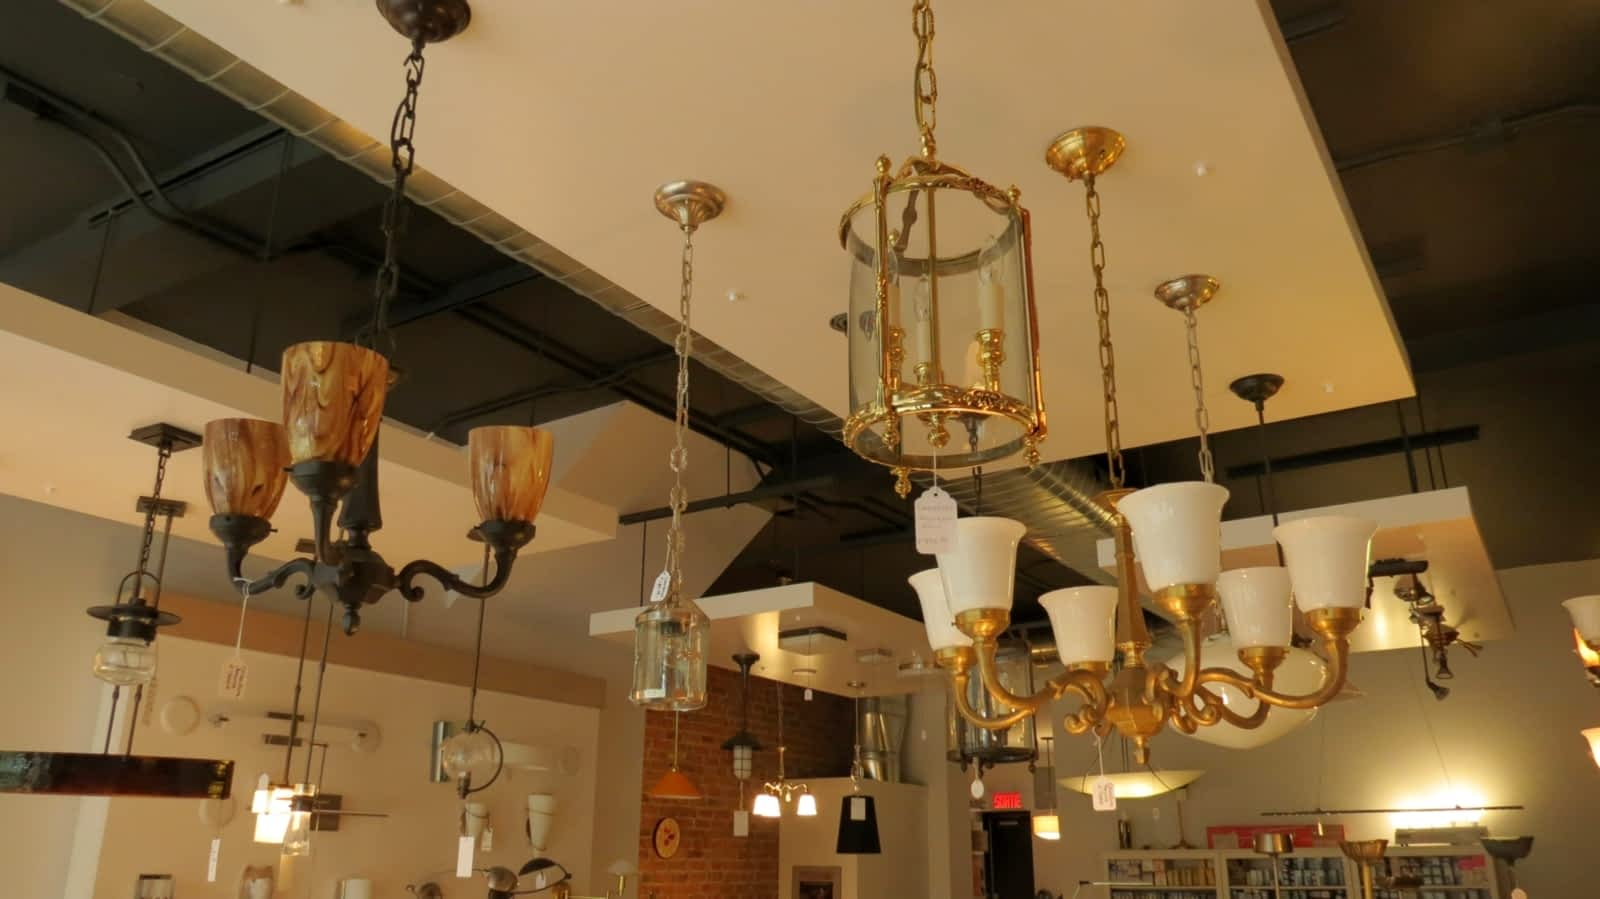 Arevco lighting inc opening hours 4205 rue sainte catherine o westmount qc